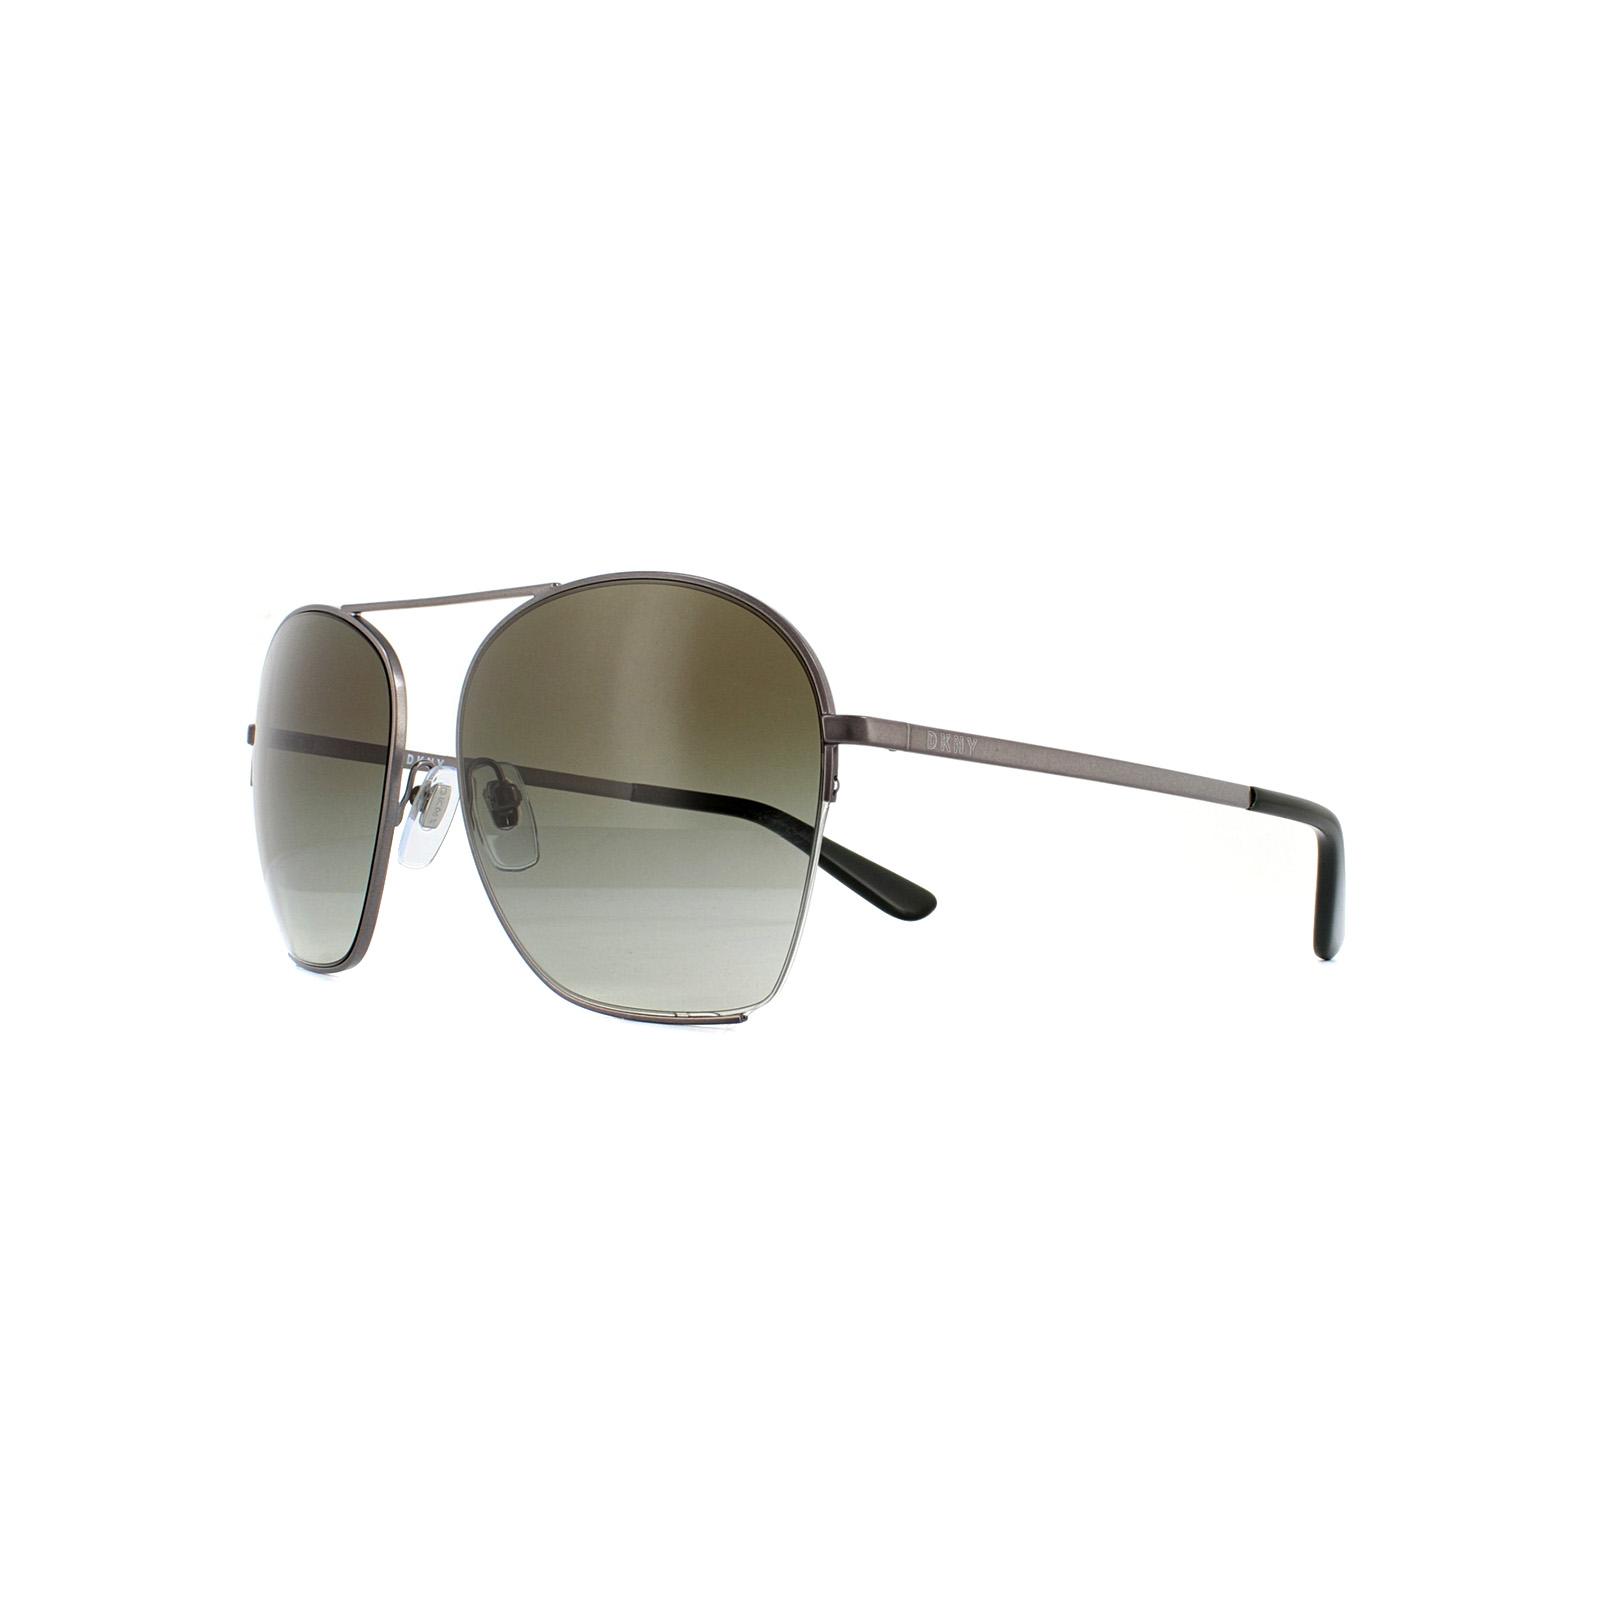 cc62b7233642 Cheap DKNY DY5086 Sunglasses - Discounted Sunglasses